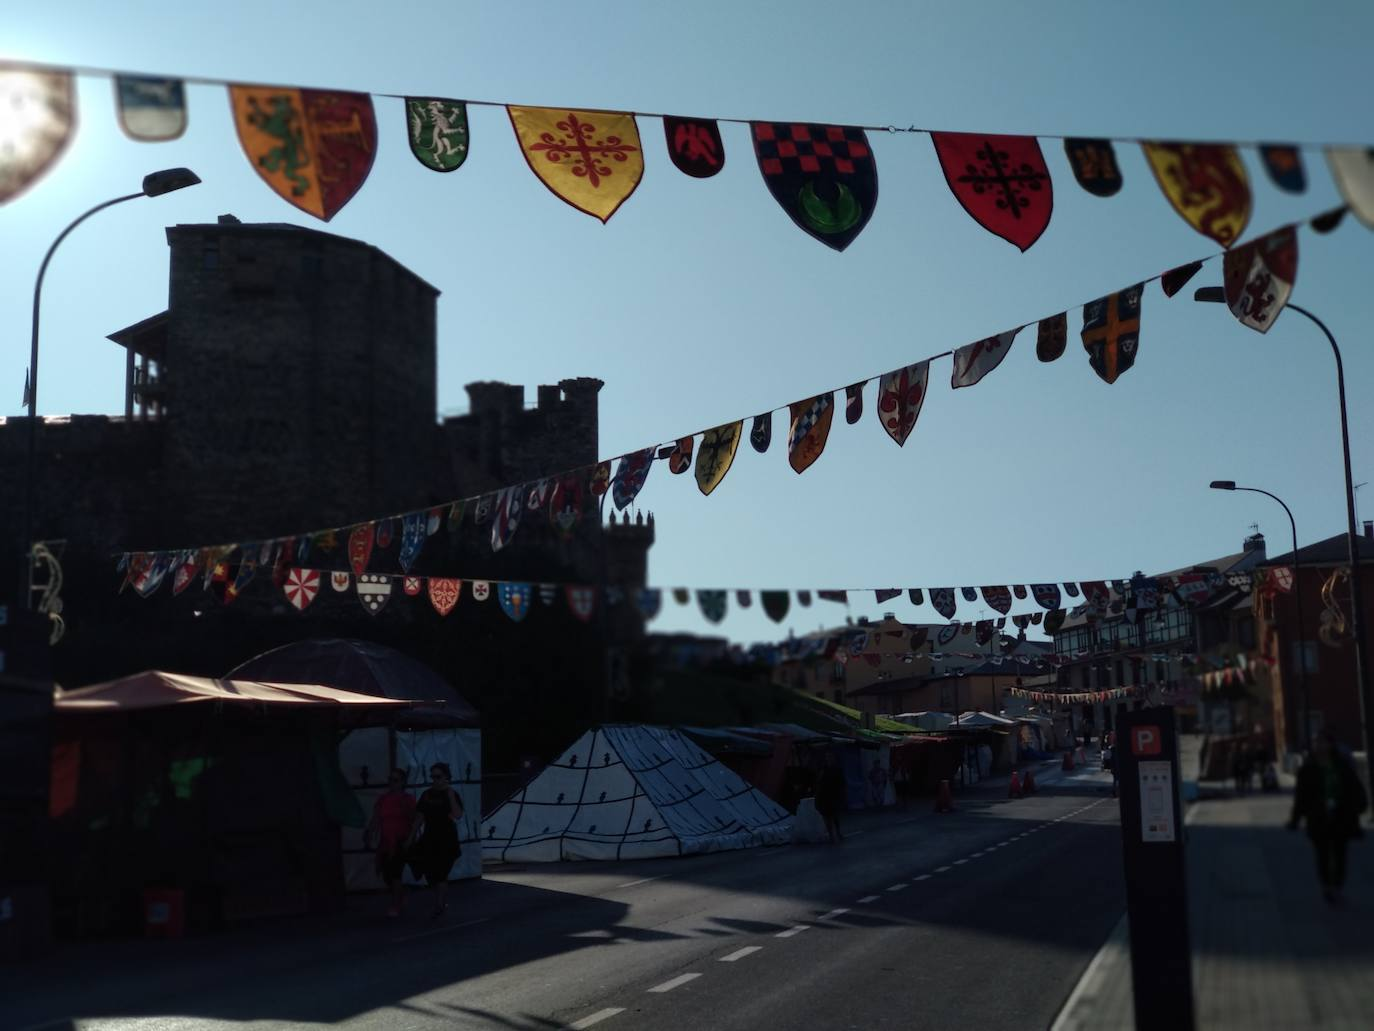 La avenida del Castillo de Ponferrada se transforma